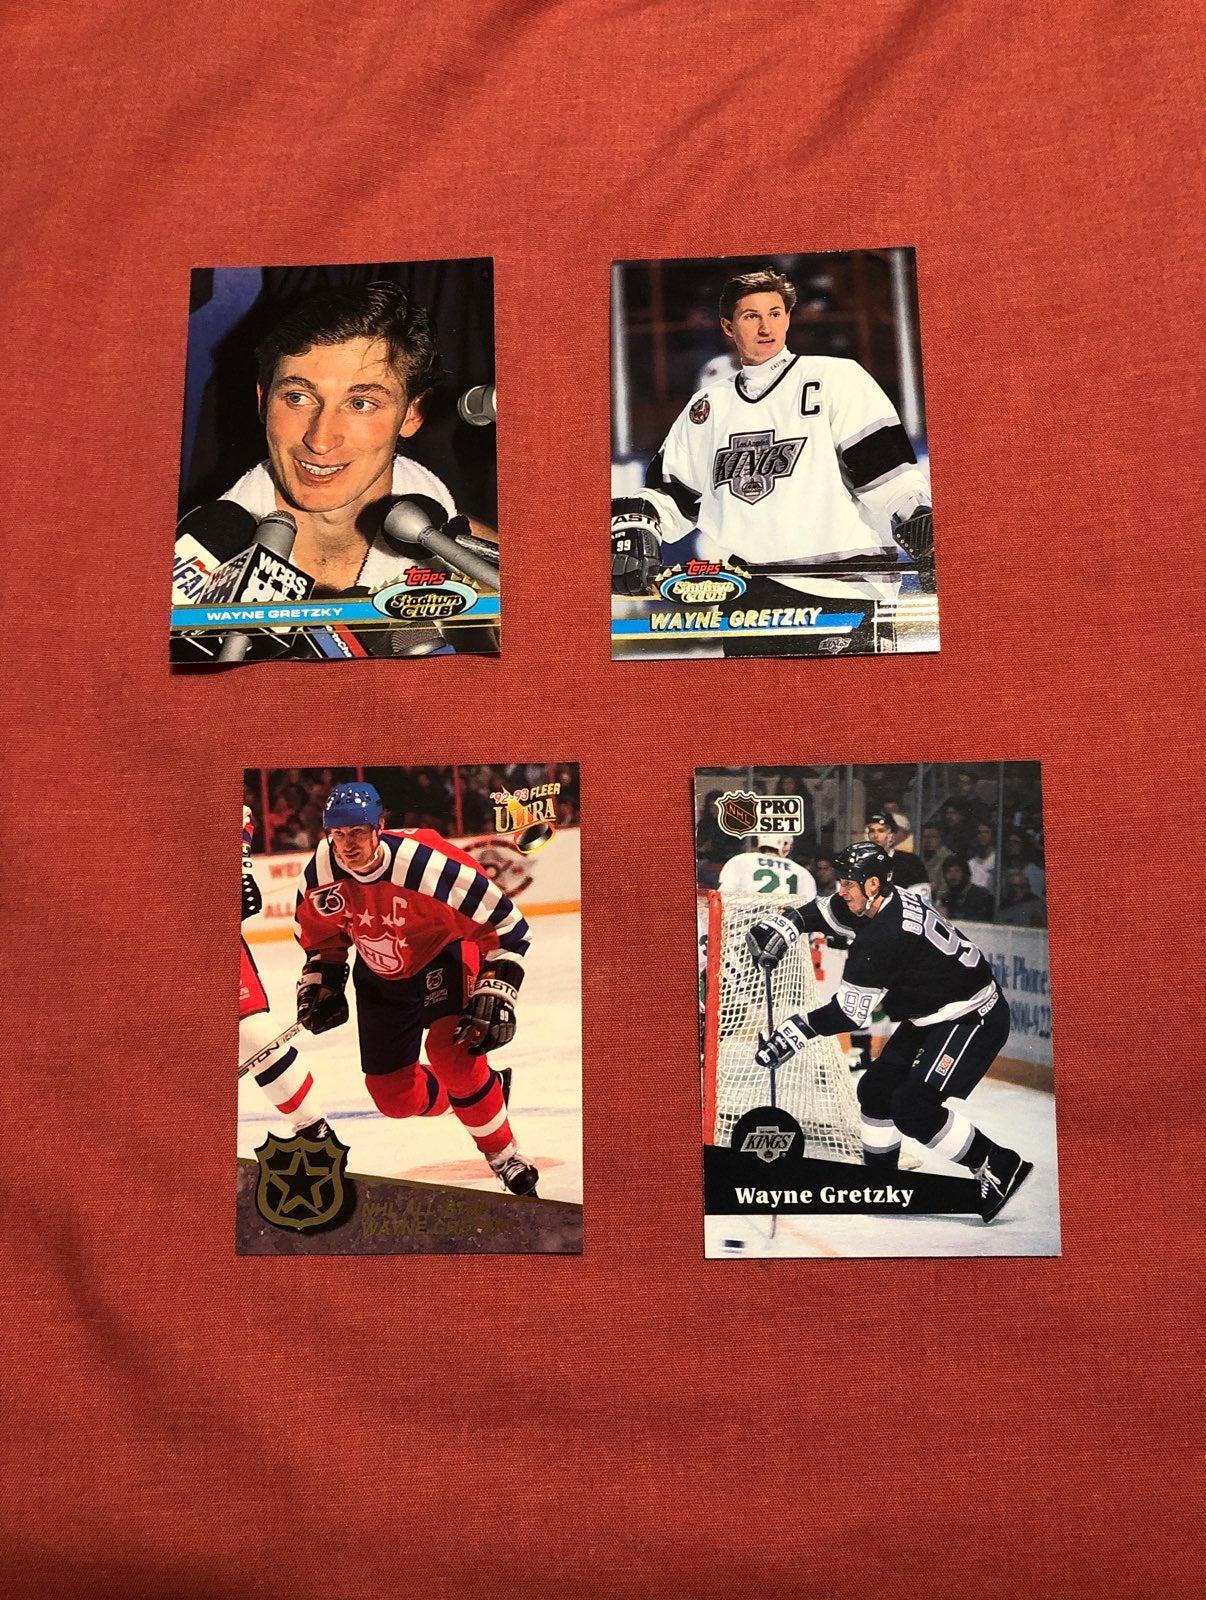 Wayne Gretzky cards (4)